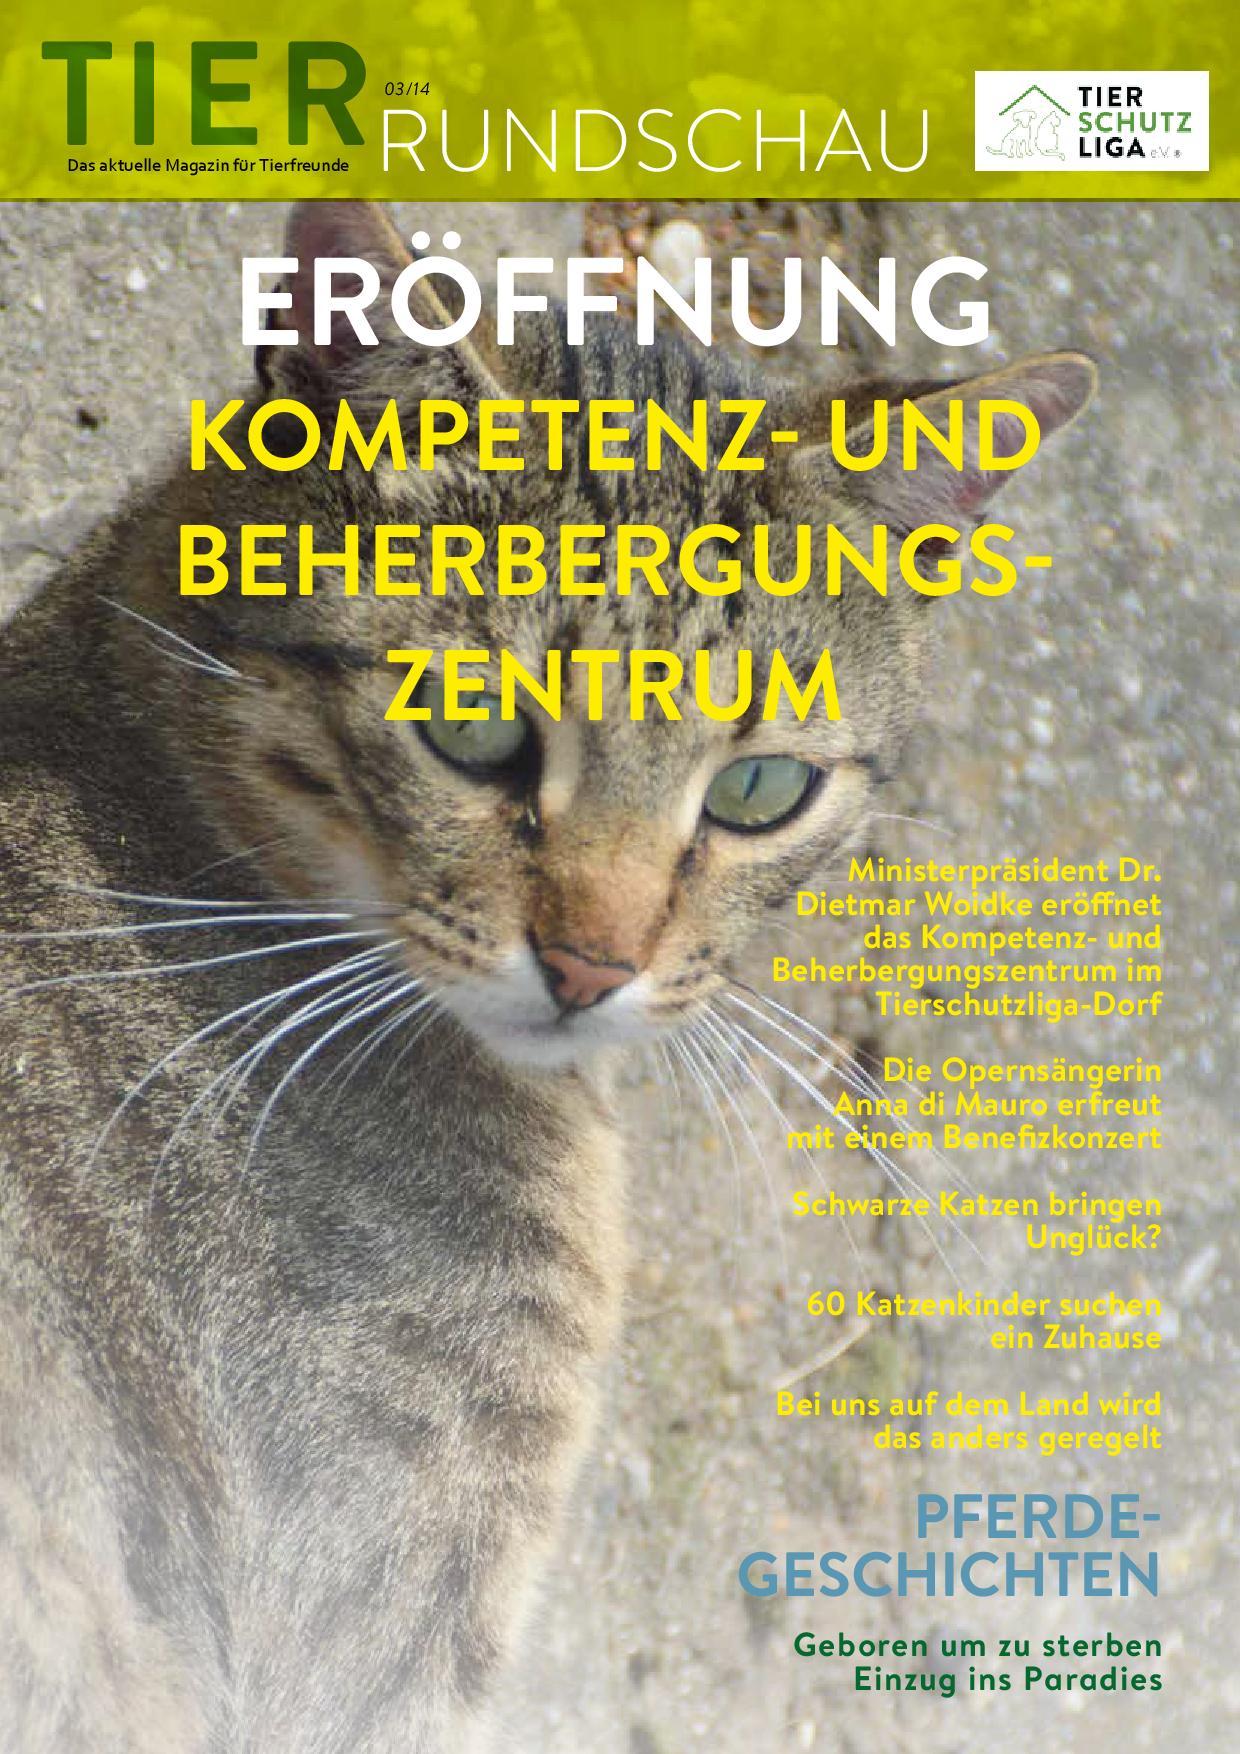 Tierrundschau-1403 Tierrundschau - aktuelles Tiermagazin